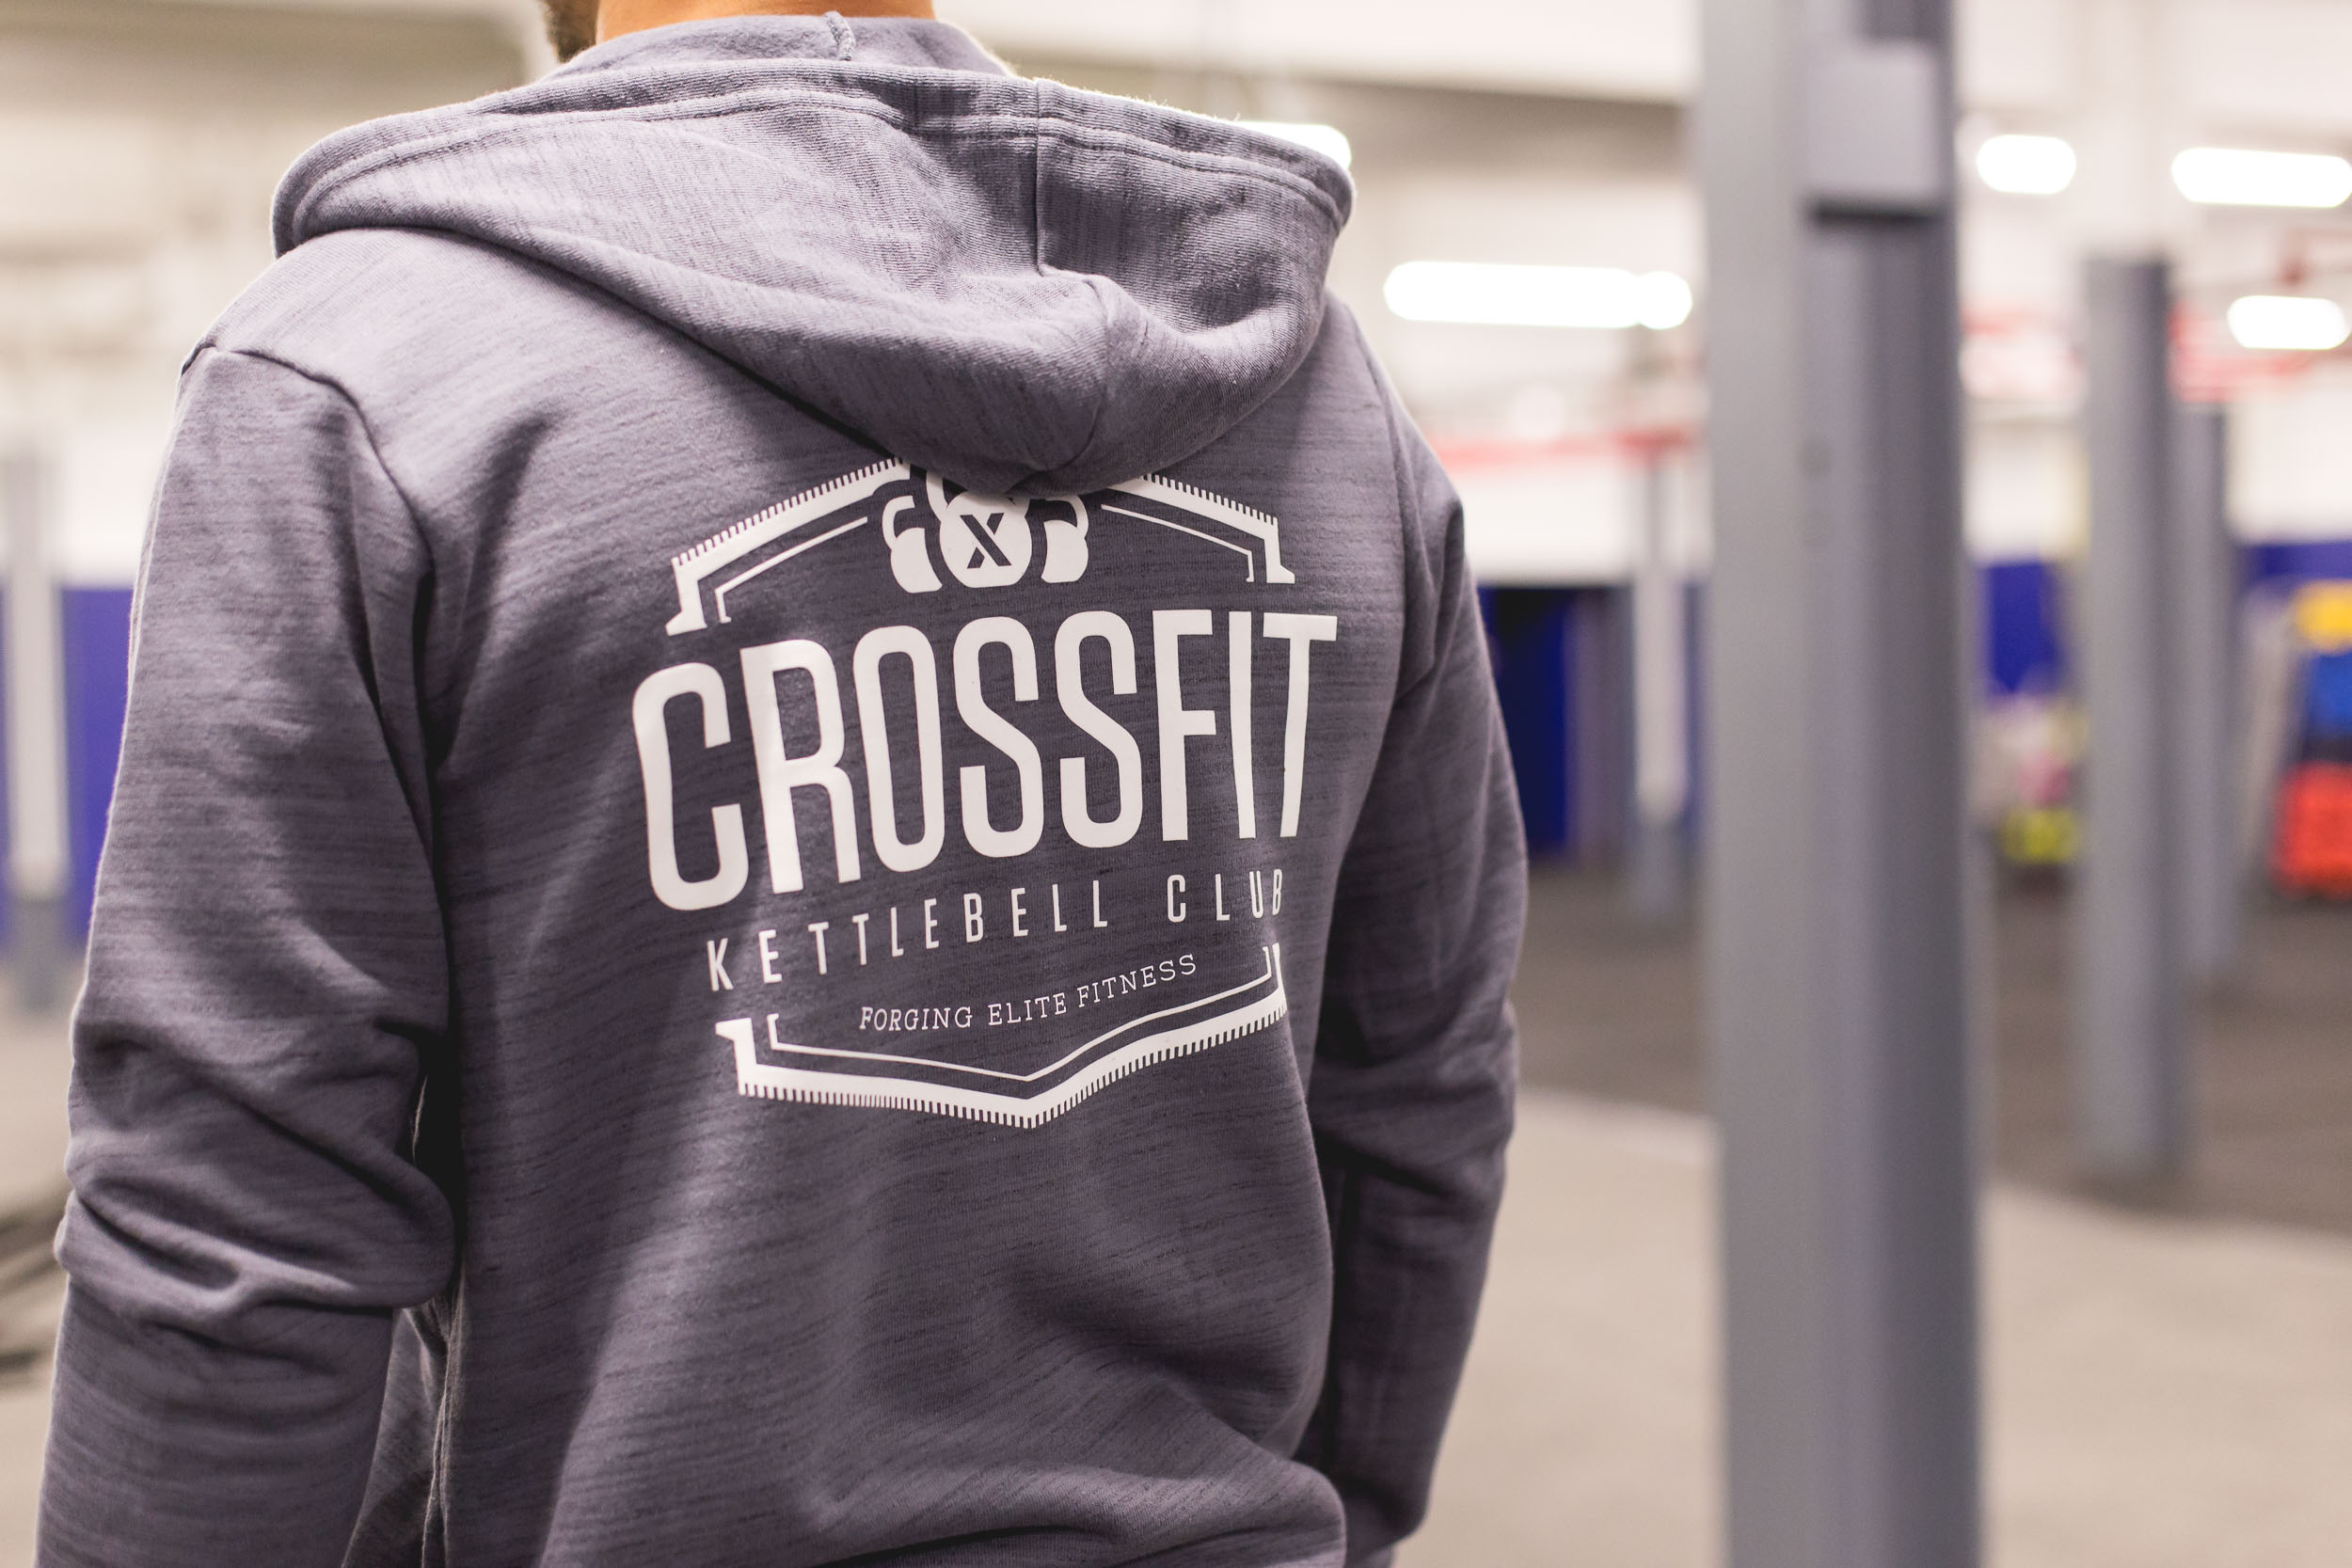 Crossfit UK printed clothing t-shirts-9351.jpg